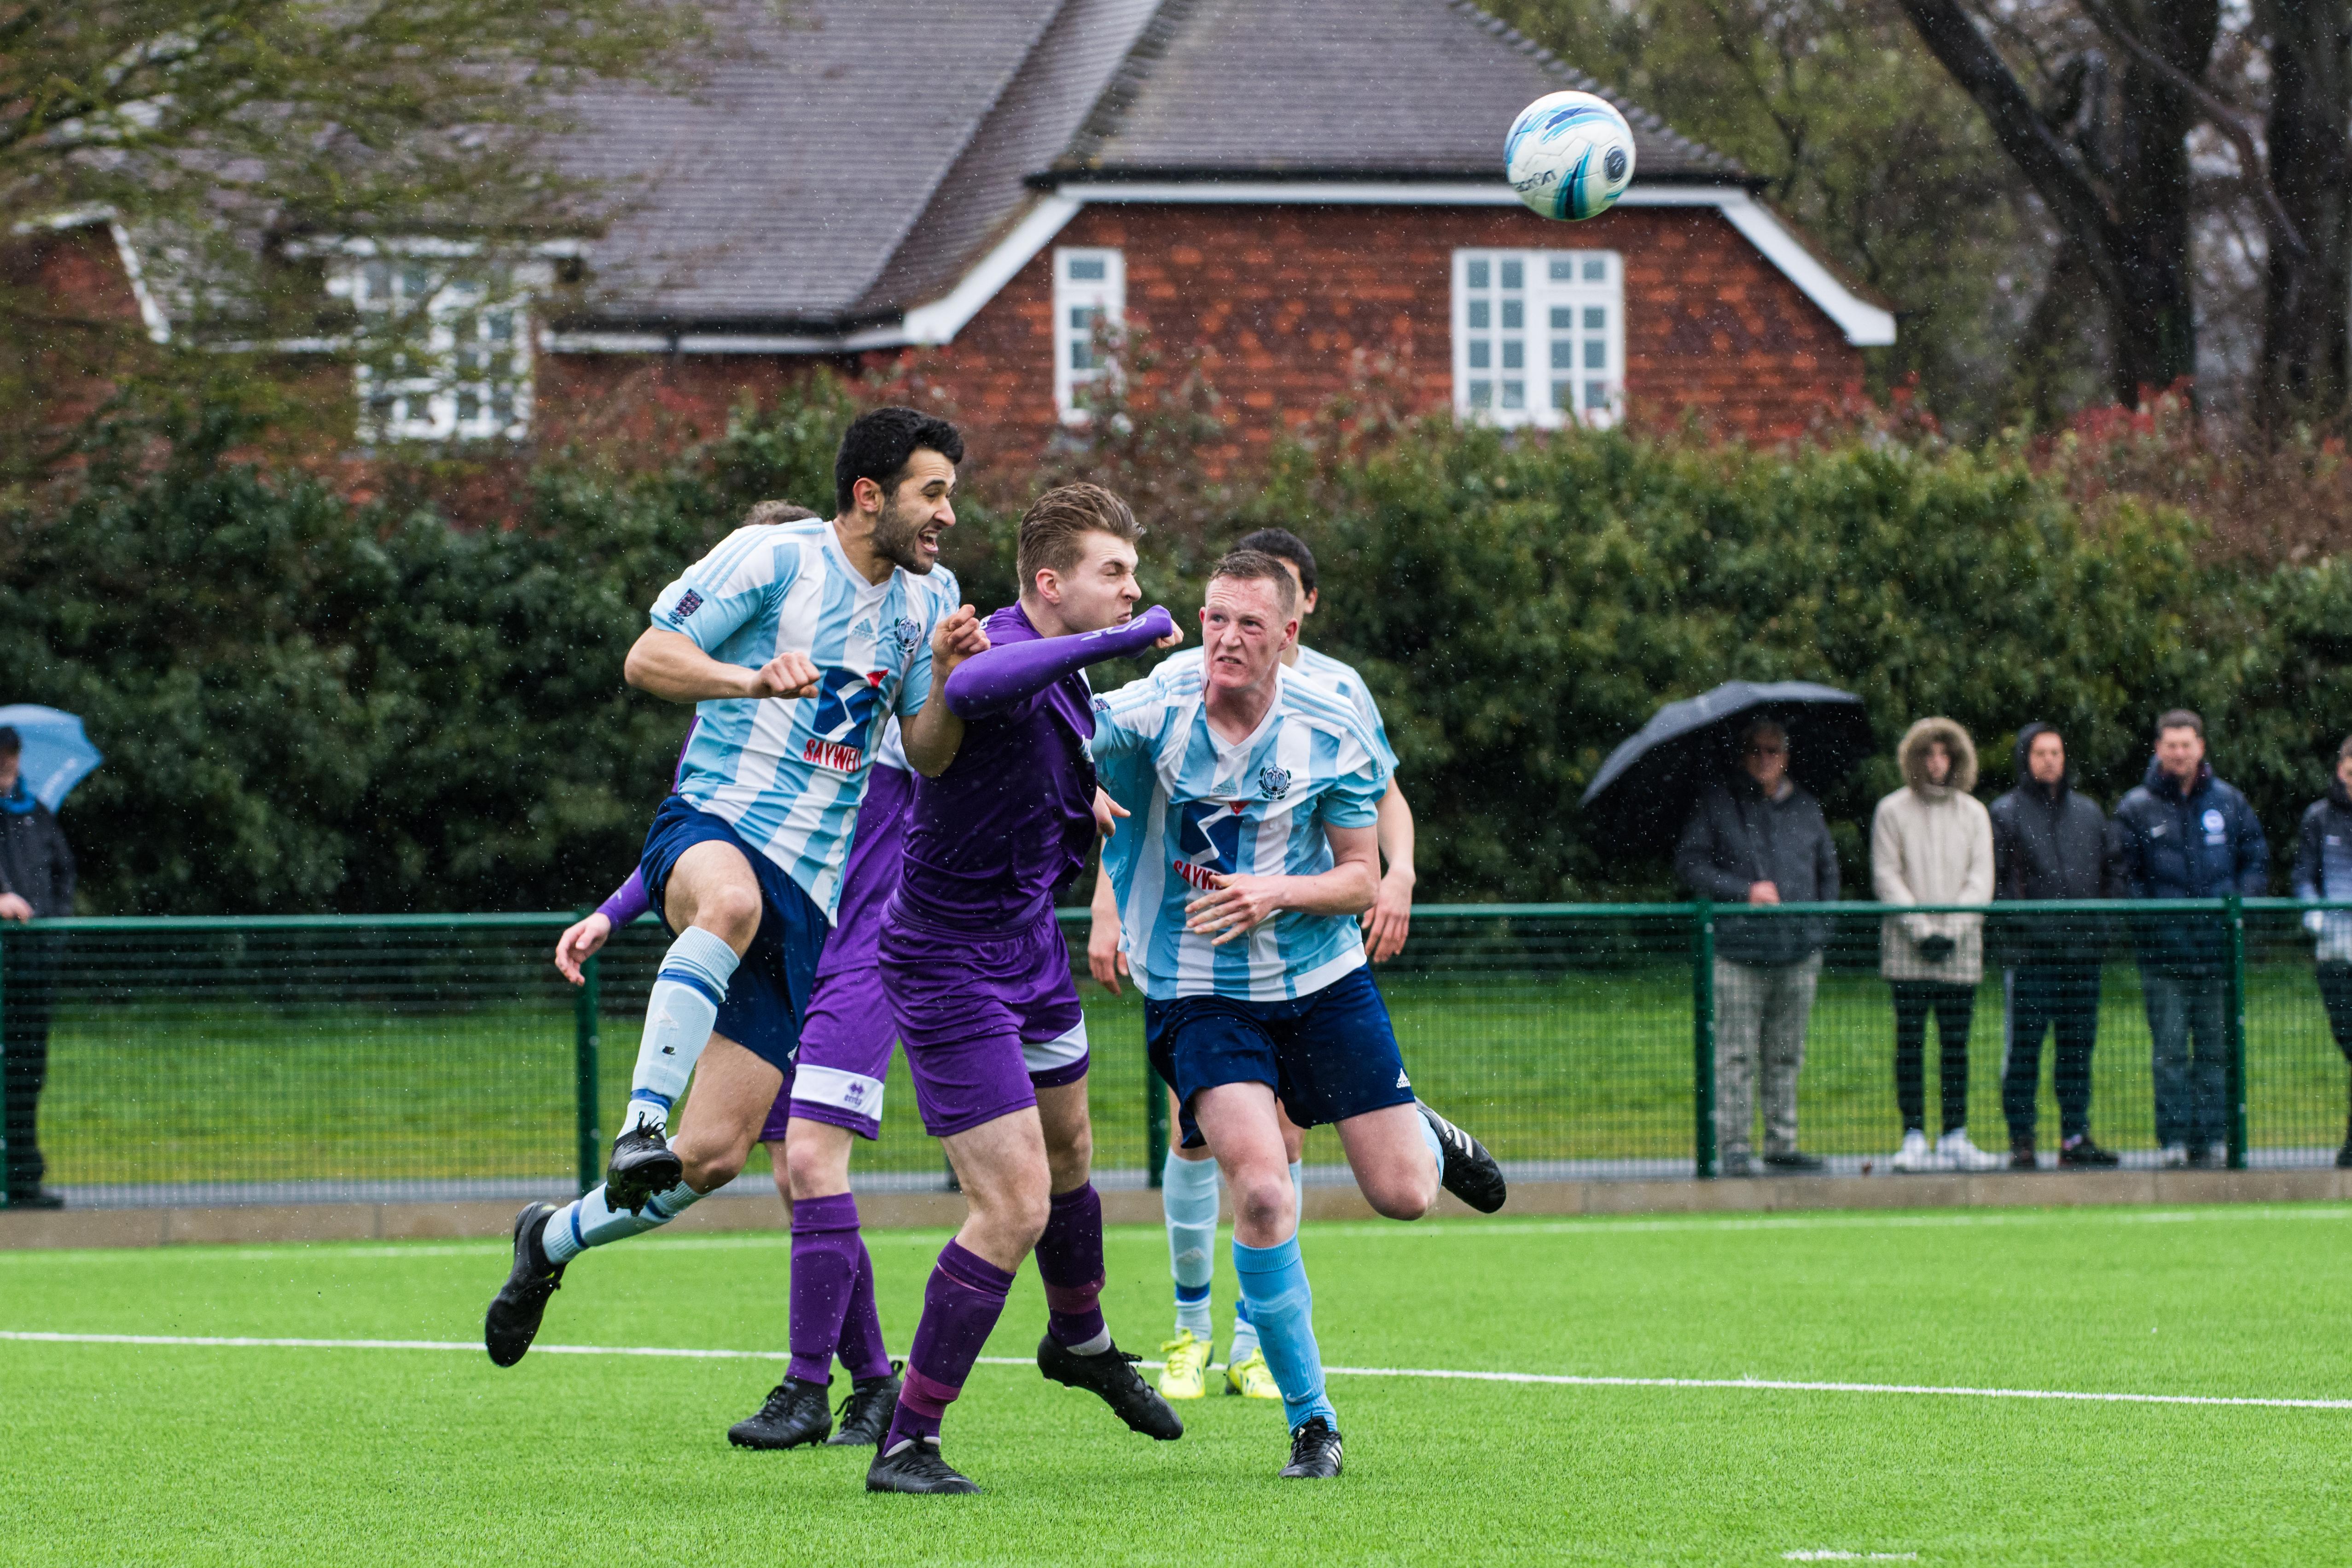 DAVID_JEFFERY Worthing United FC vs East Preston FC 02.04.18 31